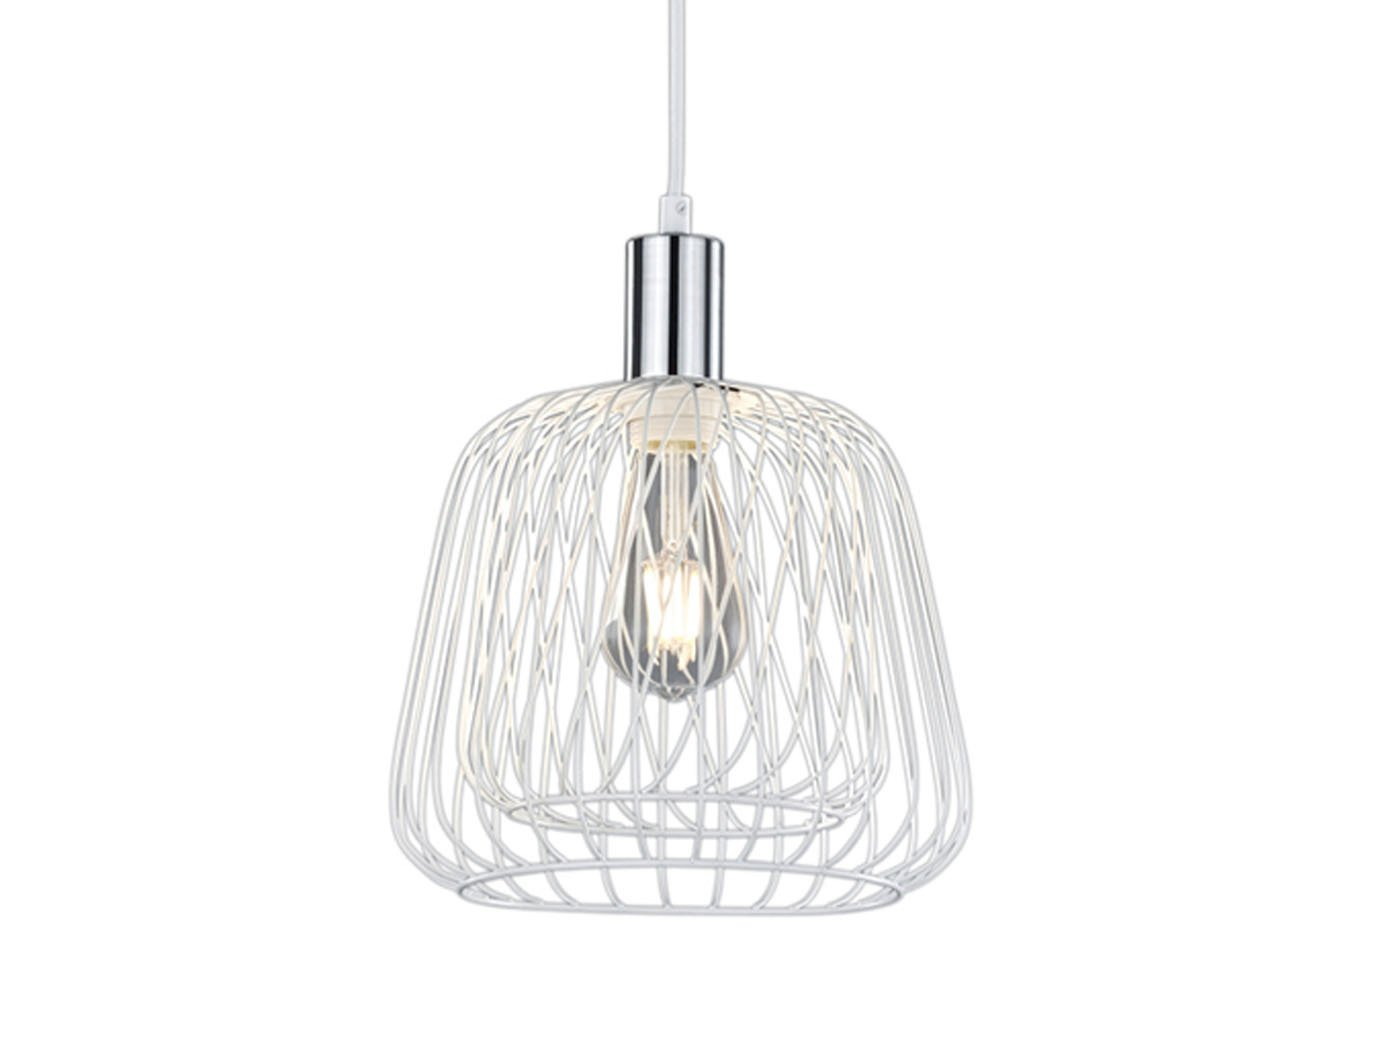 Vintage Pendelleuchte mit Filament LED, Drahtkorb, Weiß / Chrom Ø ...